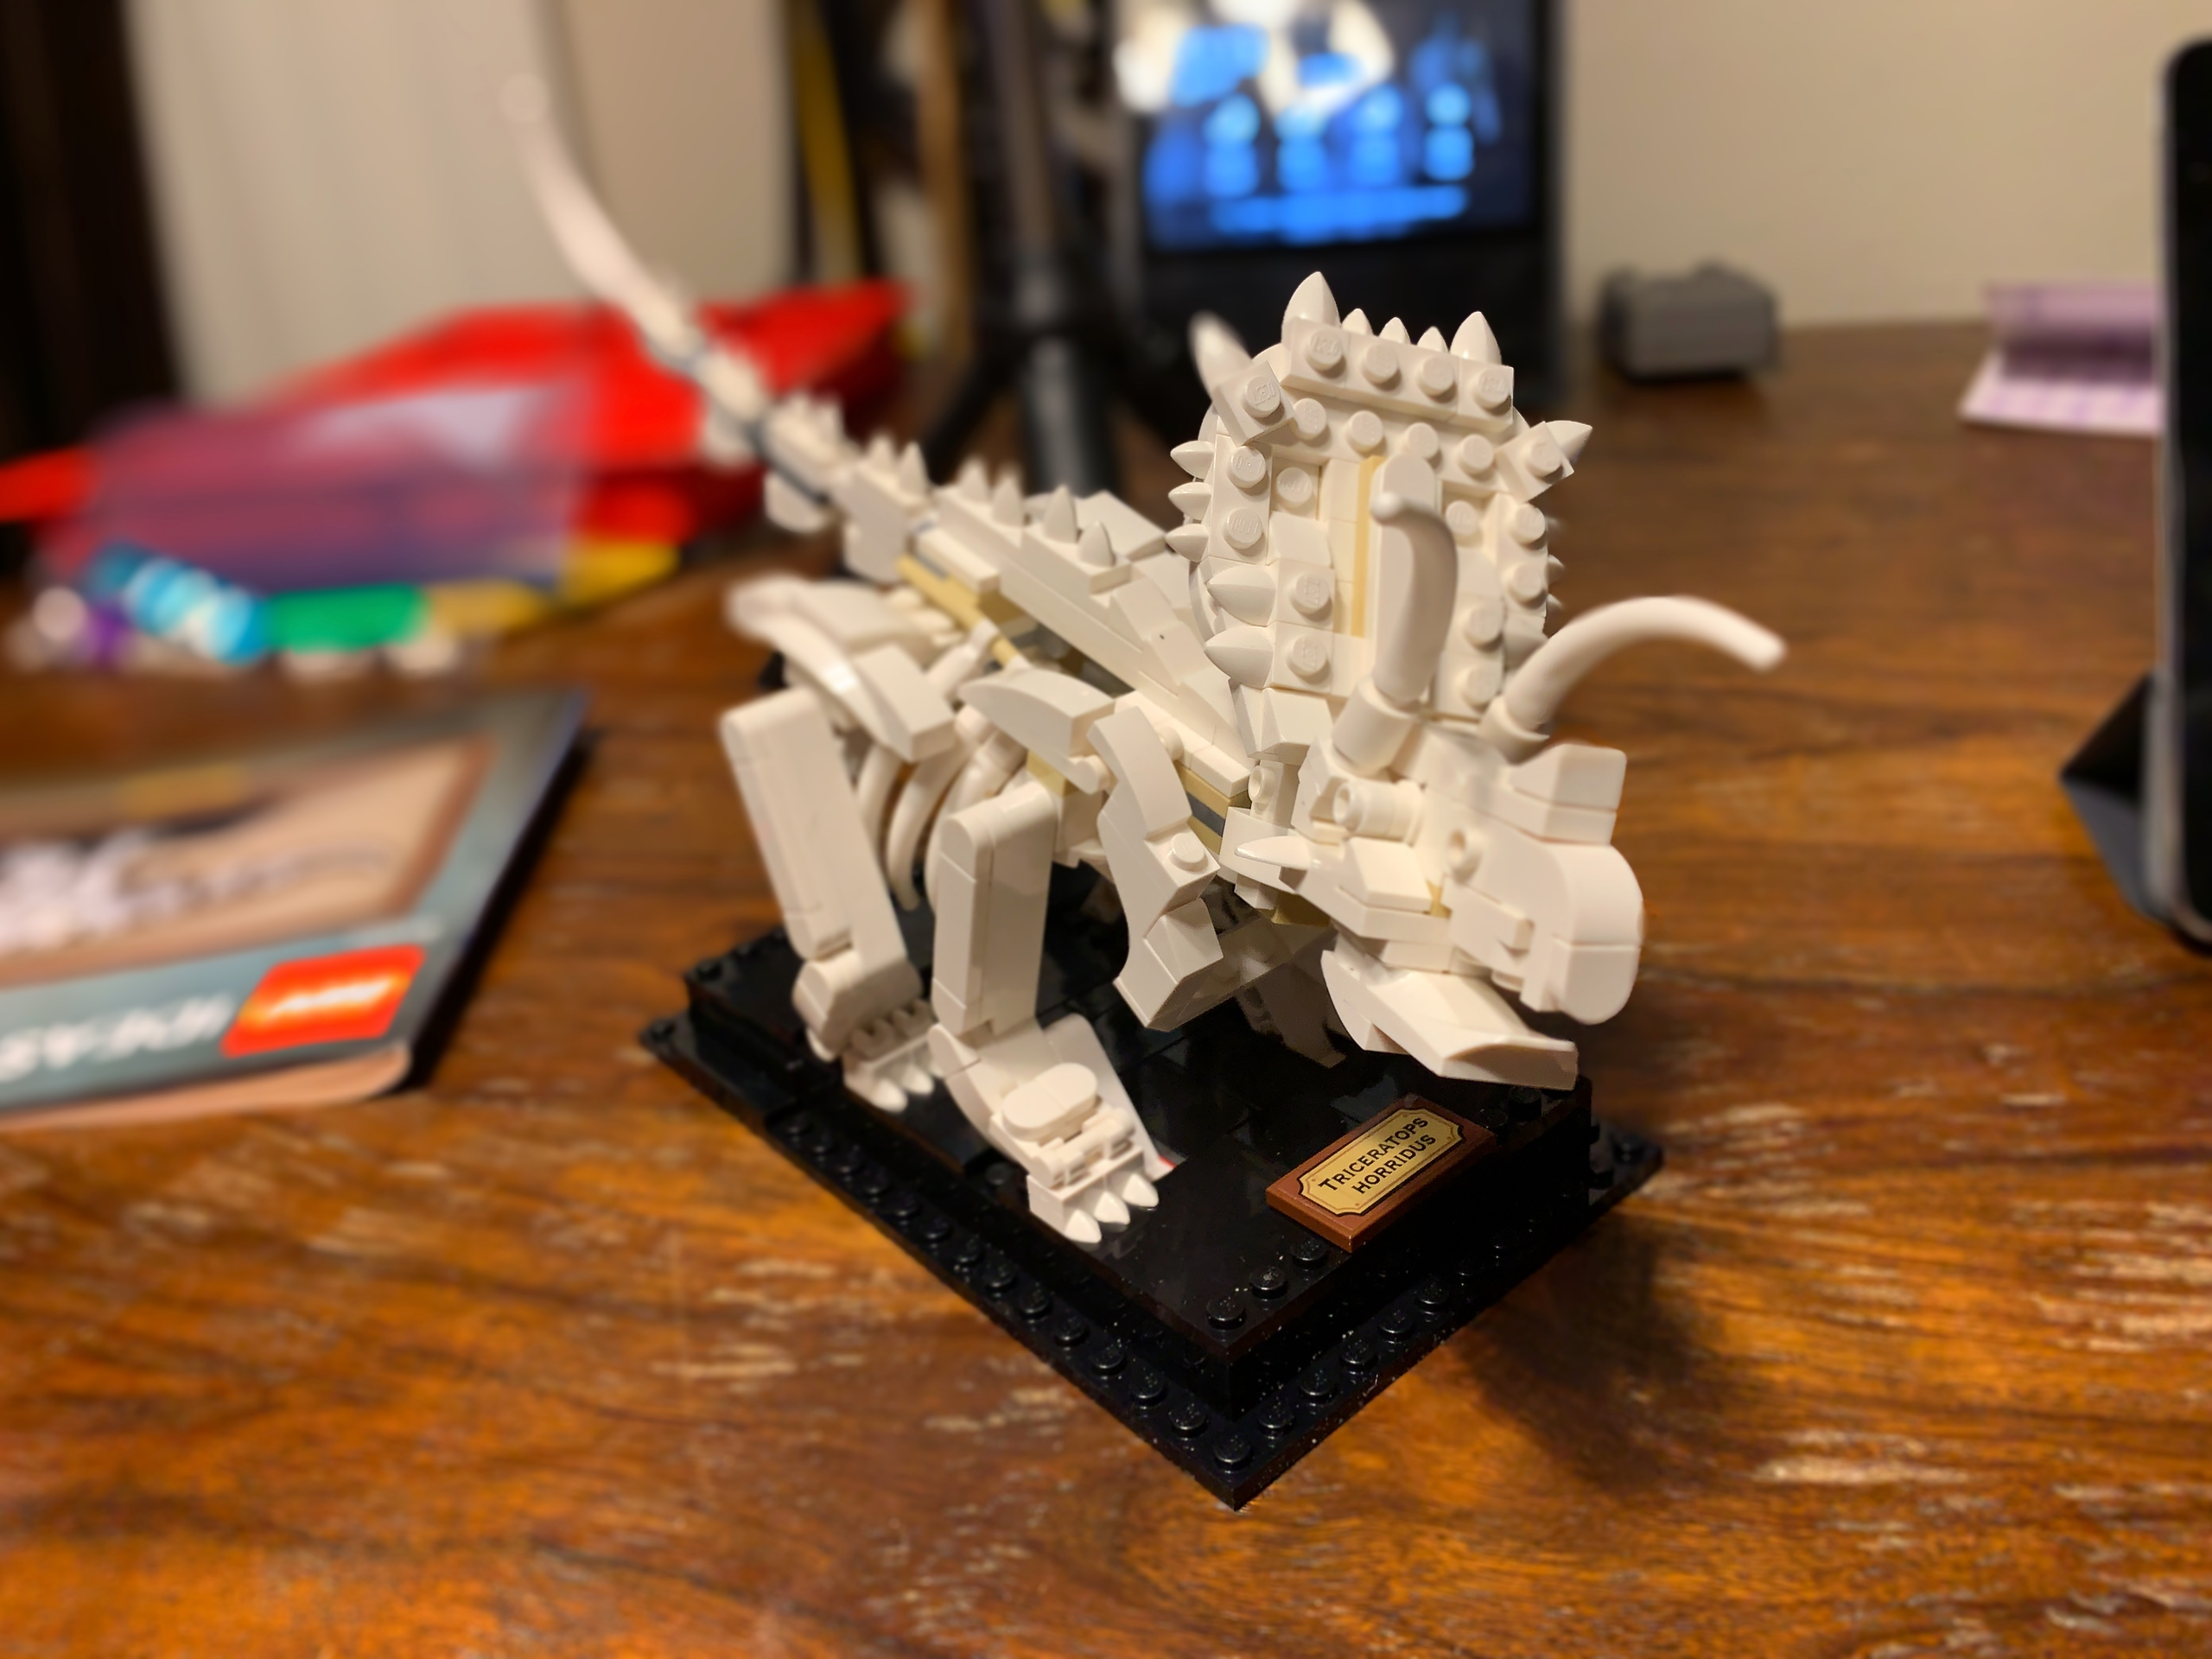 LEGO IDEAS 21320 Dinosaur Bones Builds 3